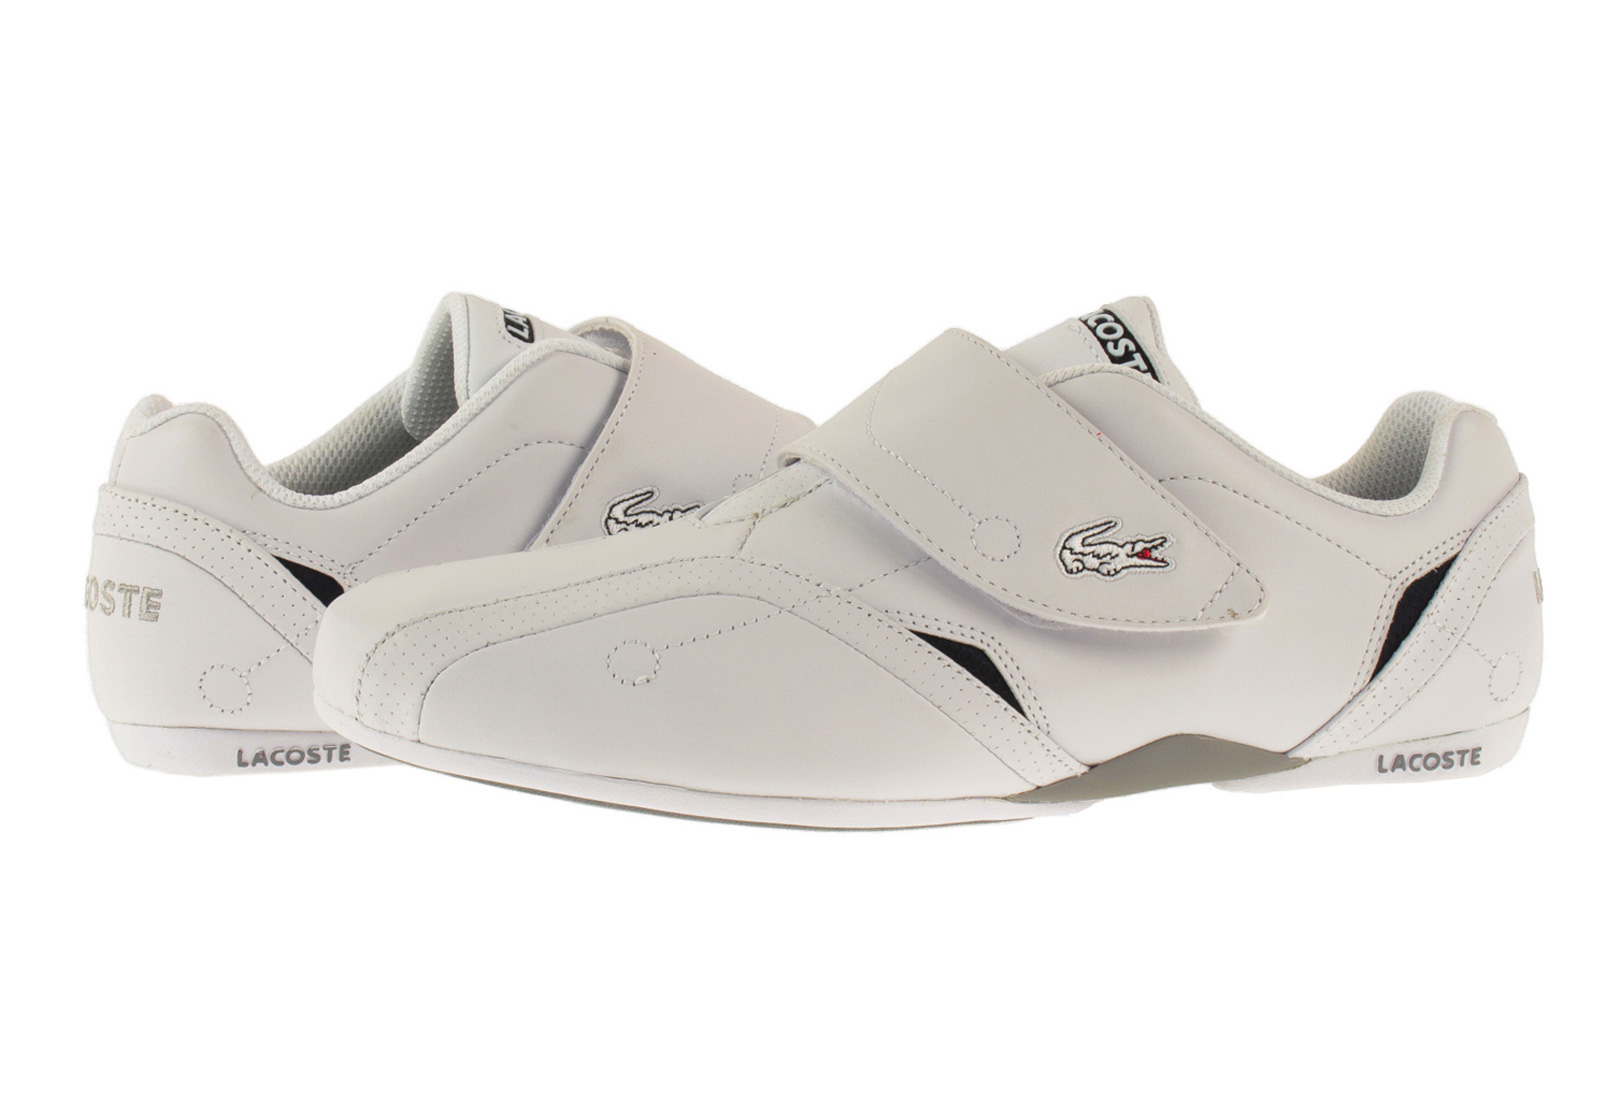 Lacoste Cipő - Protect - 13S-4026-X96 - Office Shoes Magyarország c61016acf6